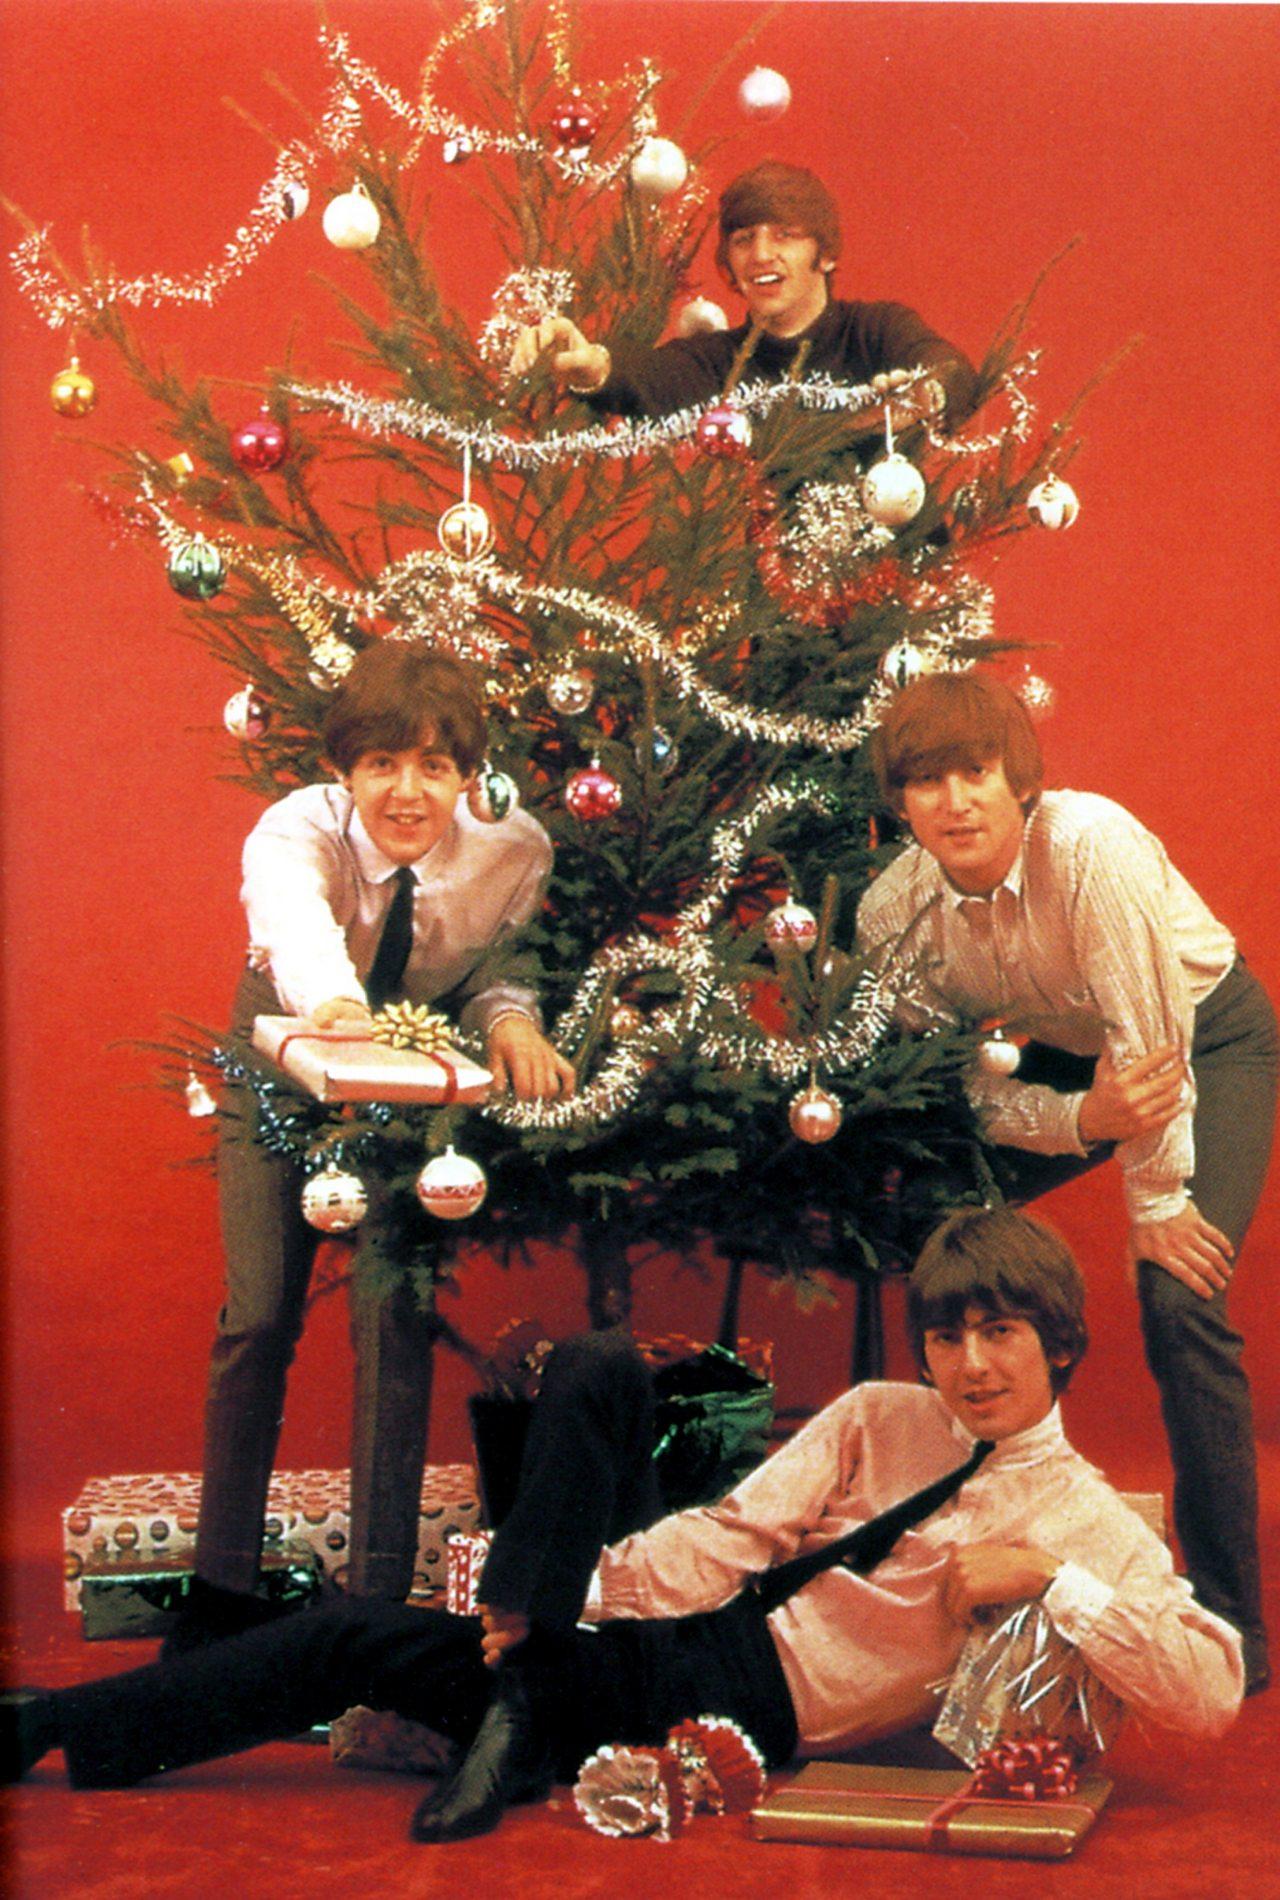 The Beatles around a Christmas tree